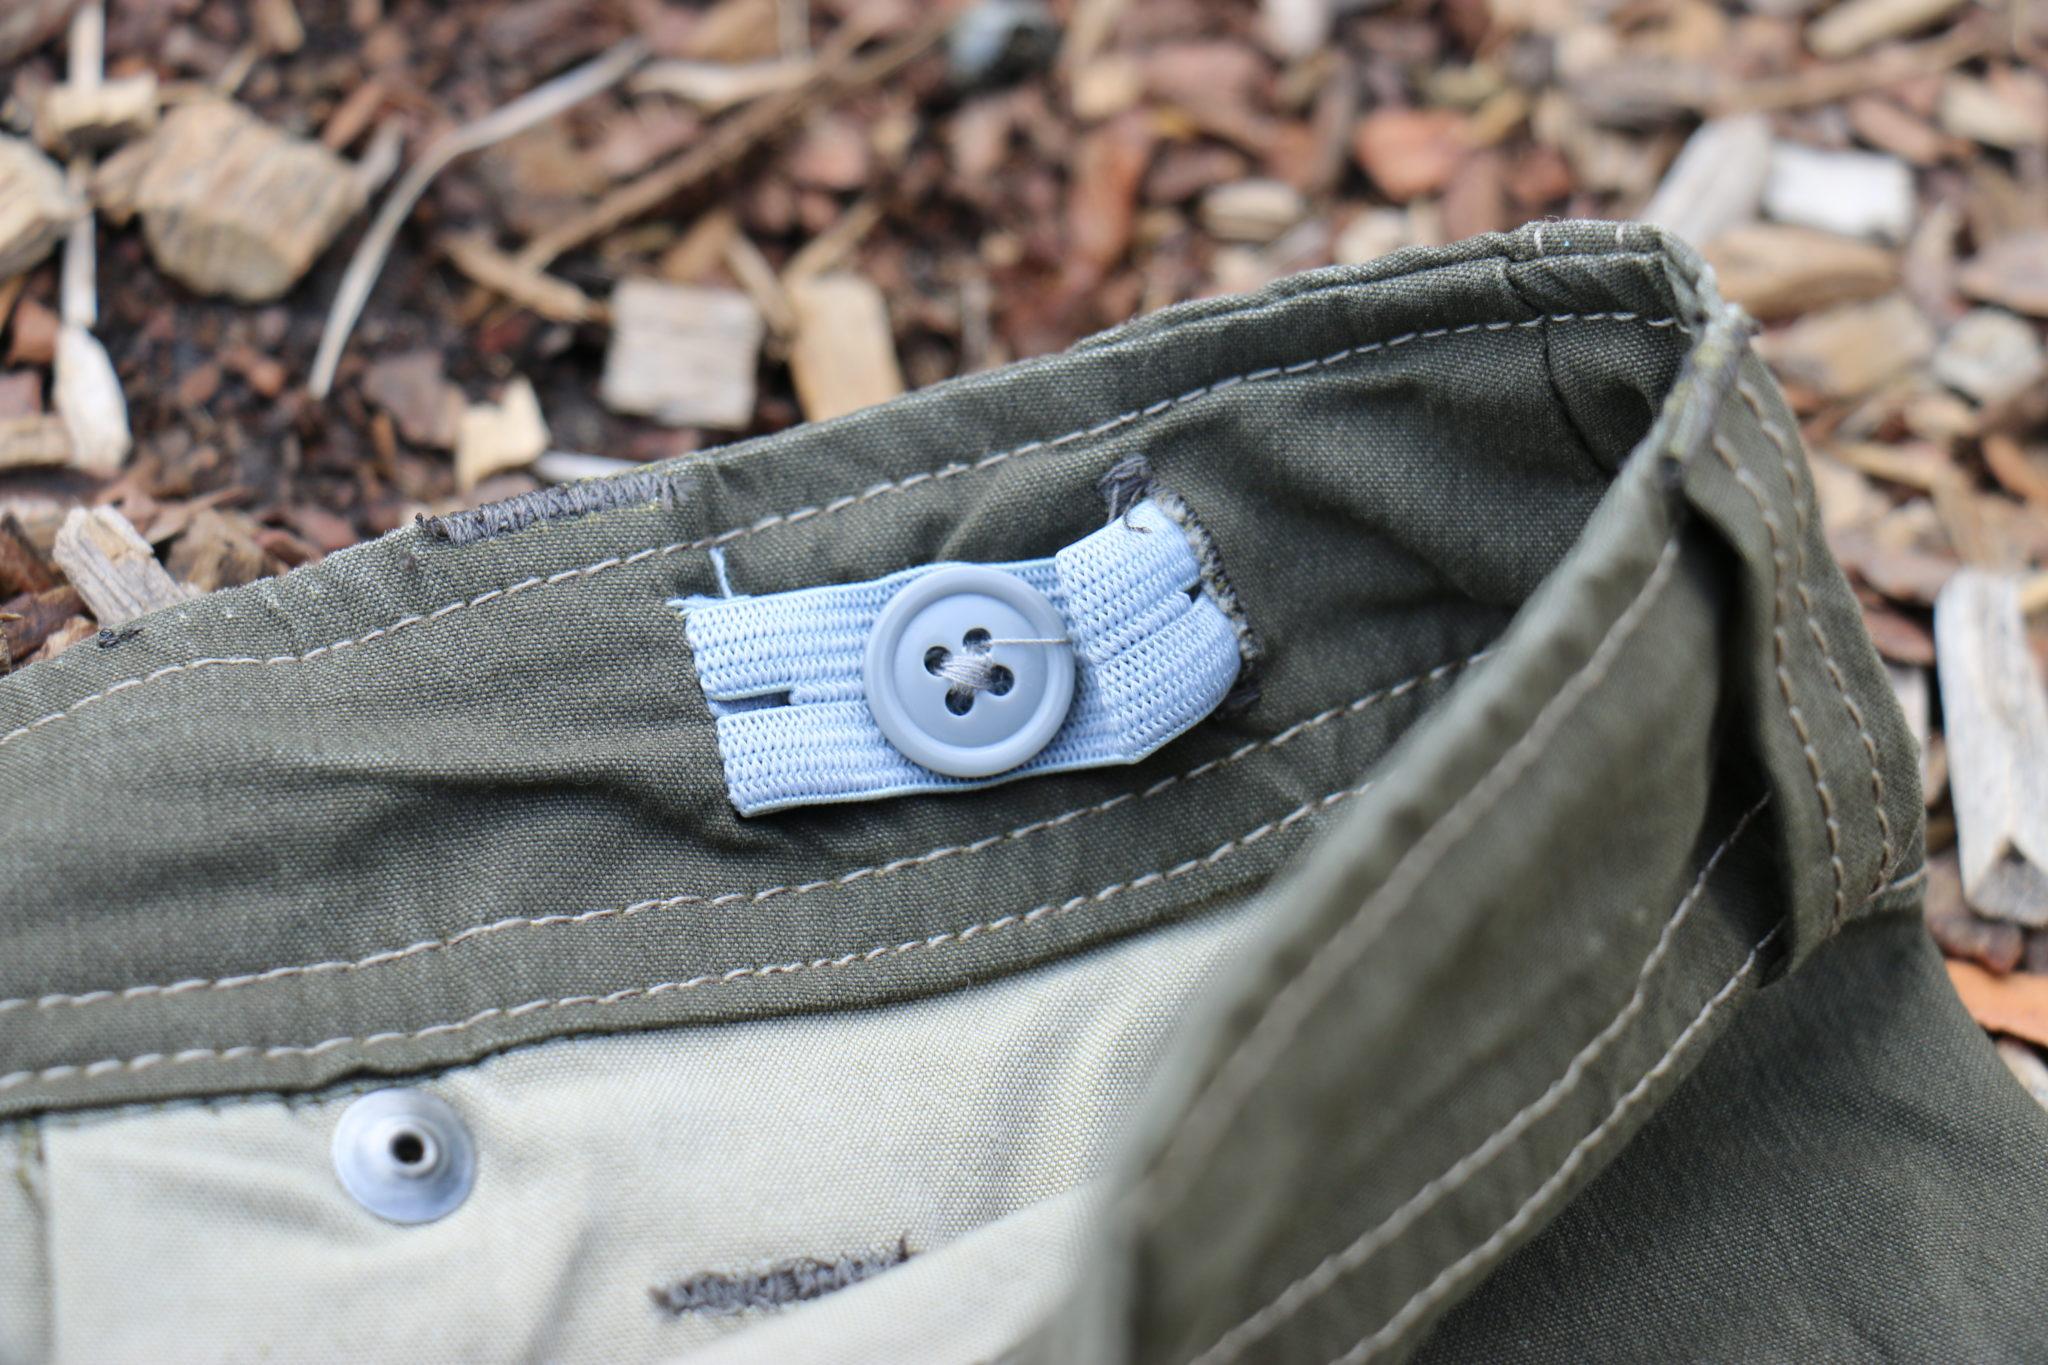 Adjustable inner waistband